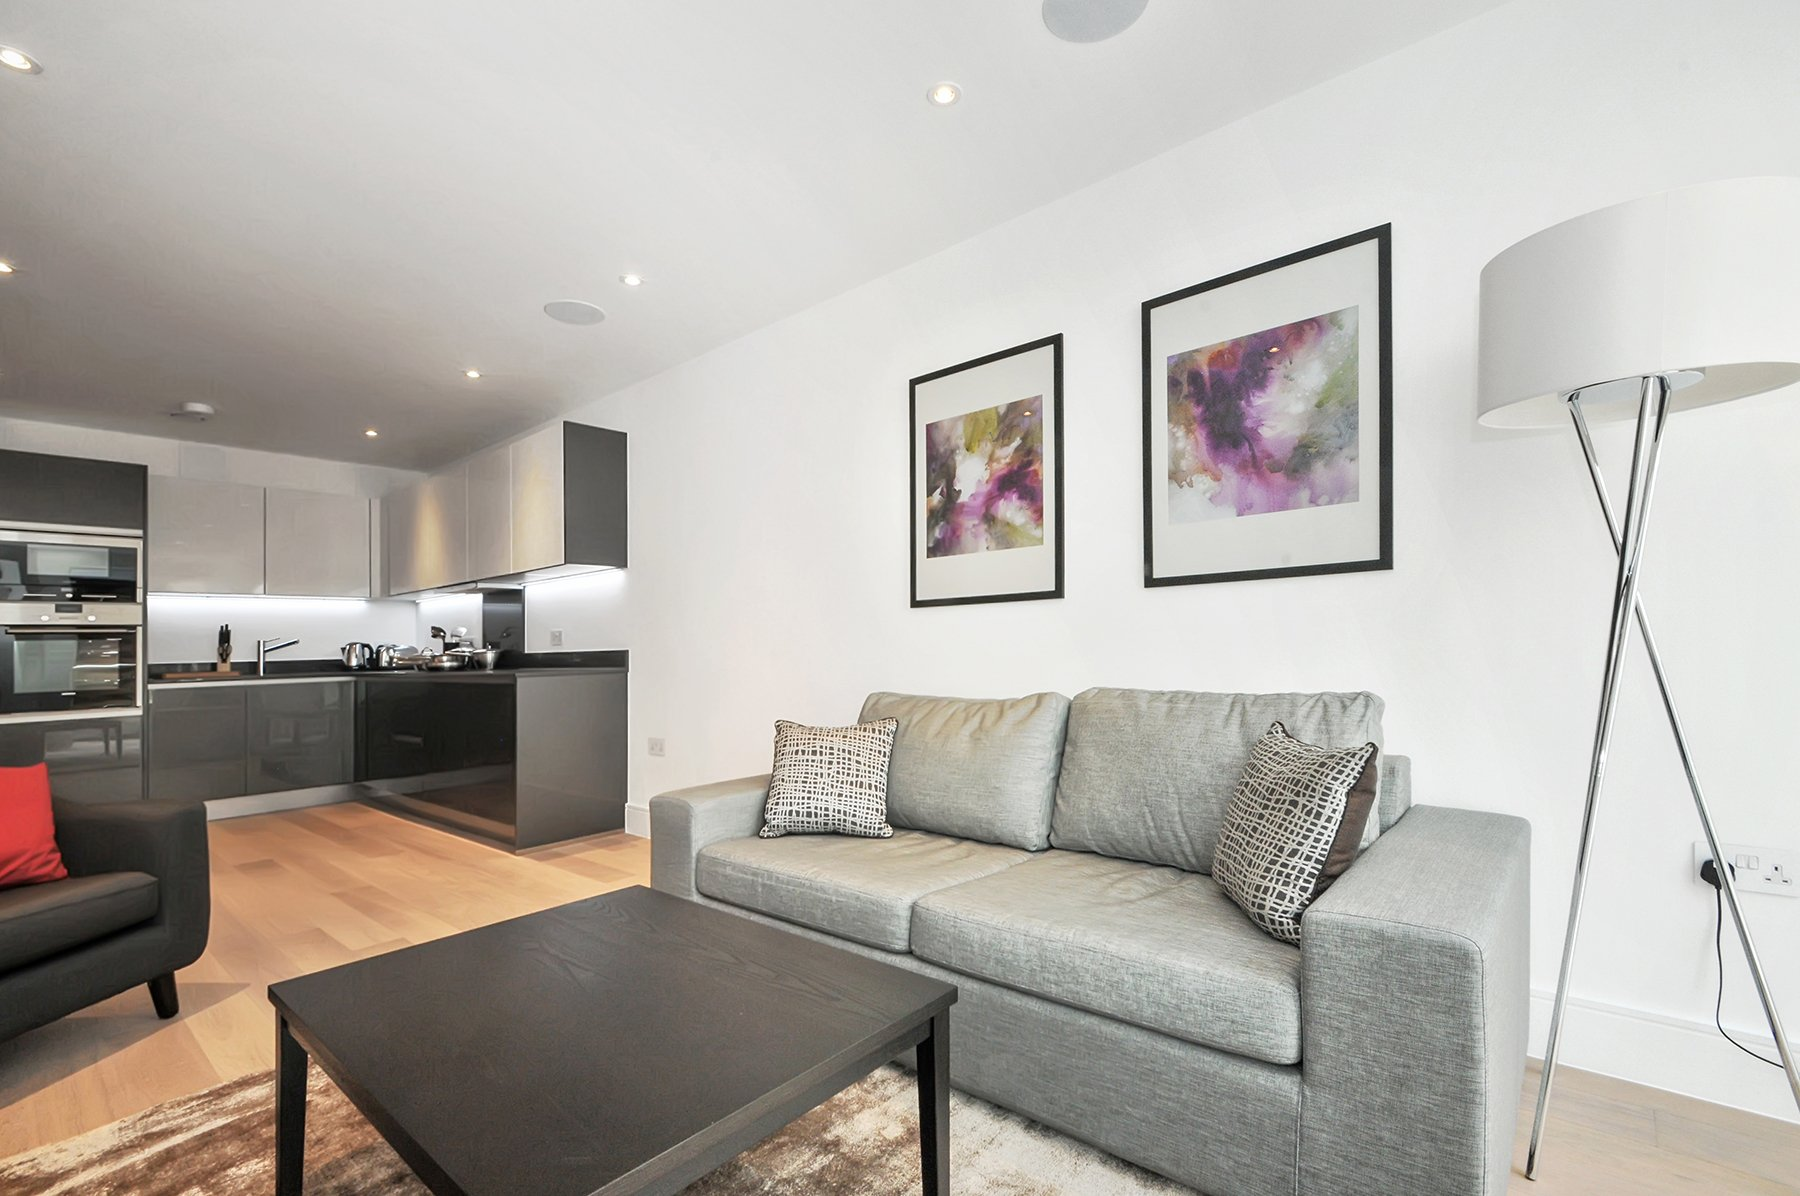 Corporate-Accommodation-Farringdon---London-City-Serviced-Apartments-|-Award-Winning-Short-Stay-Apartments-London---Cheap-Hotel-Alternative-|-Book-now!-Urban-Stay